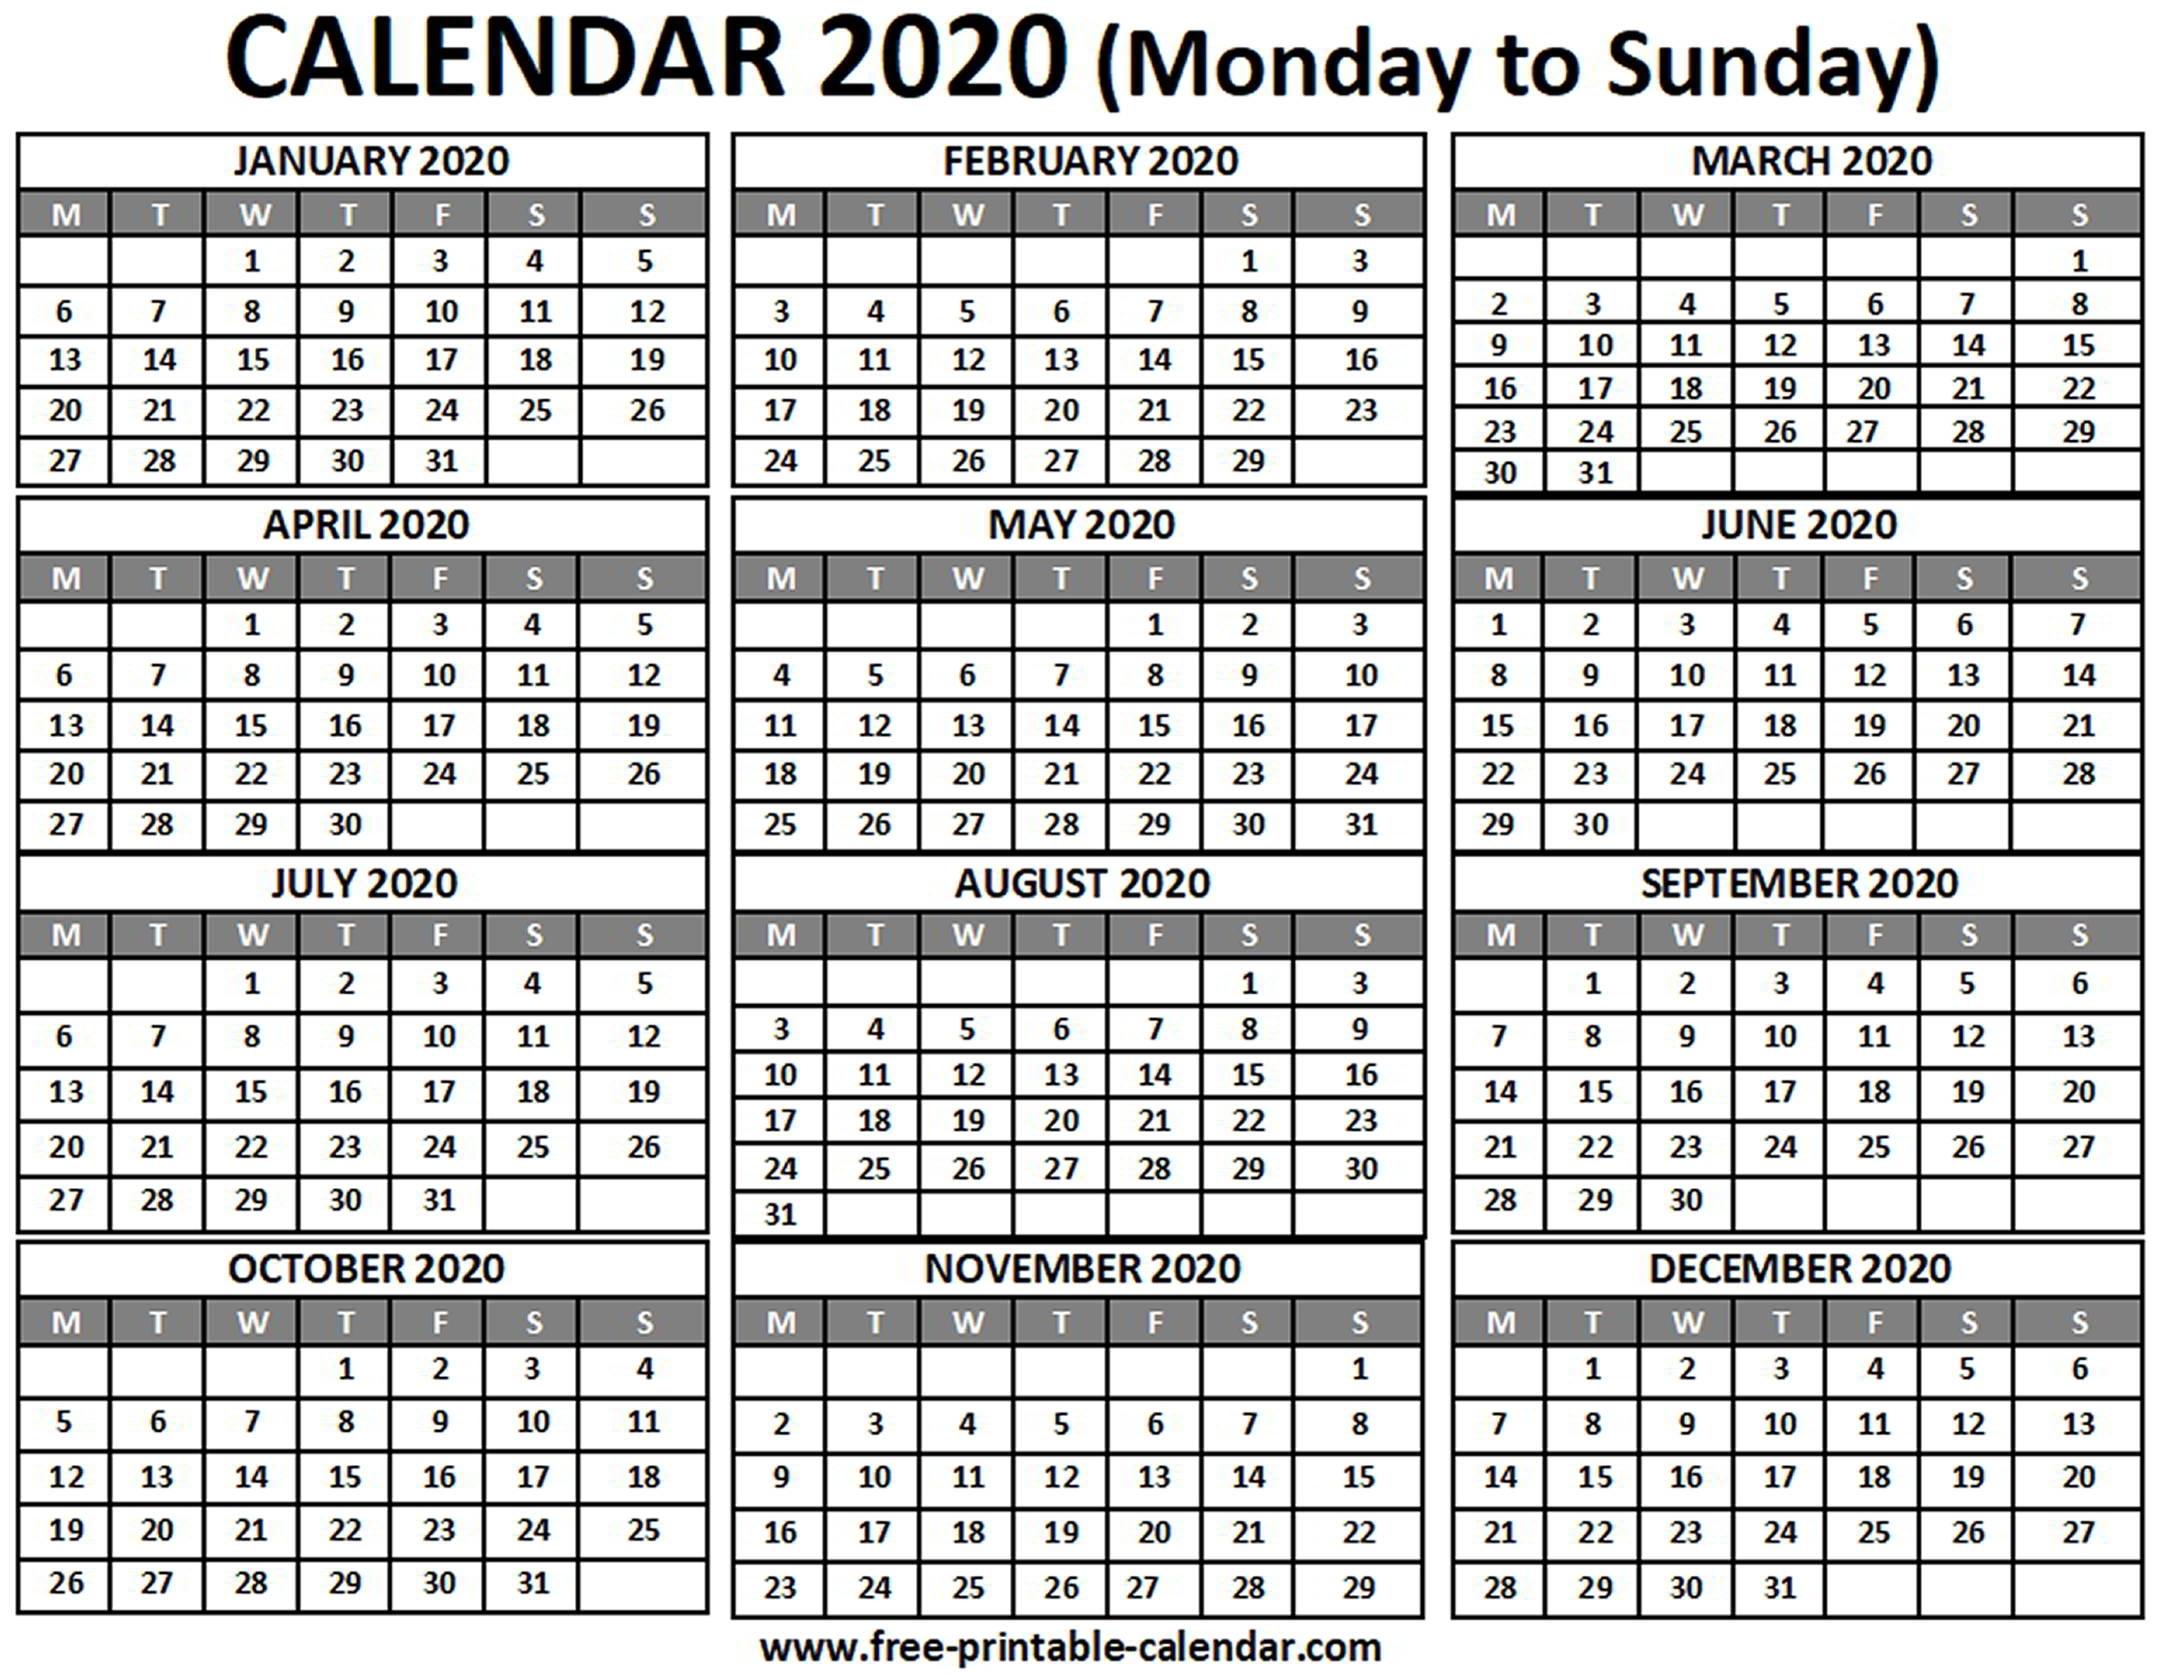 2020 Calendar - Free-Printable-Calendar regarding Free Calendars 2020 Start With Monday